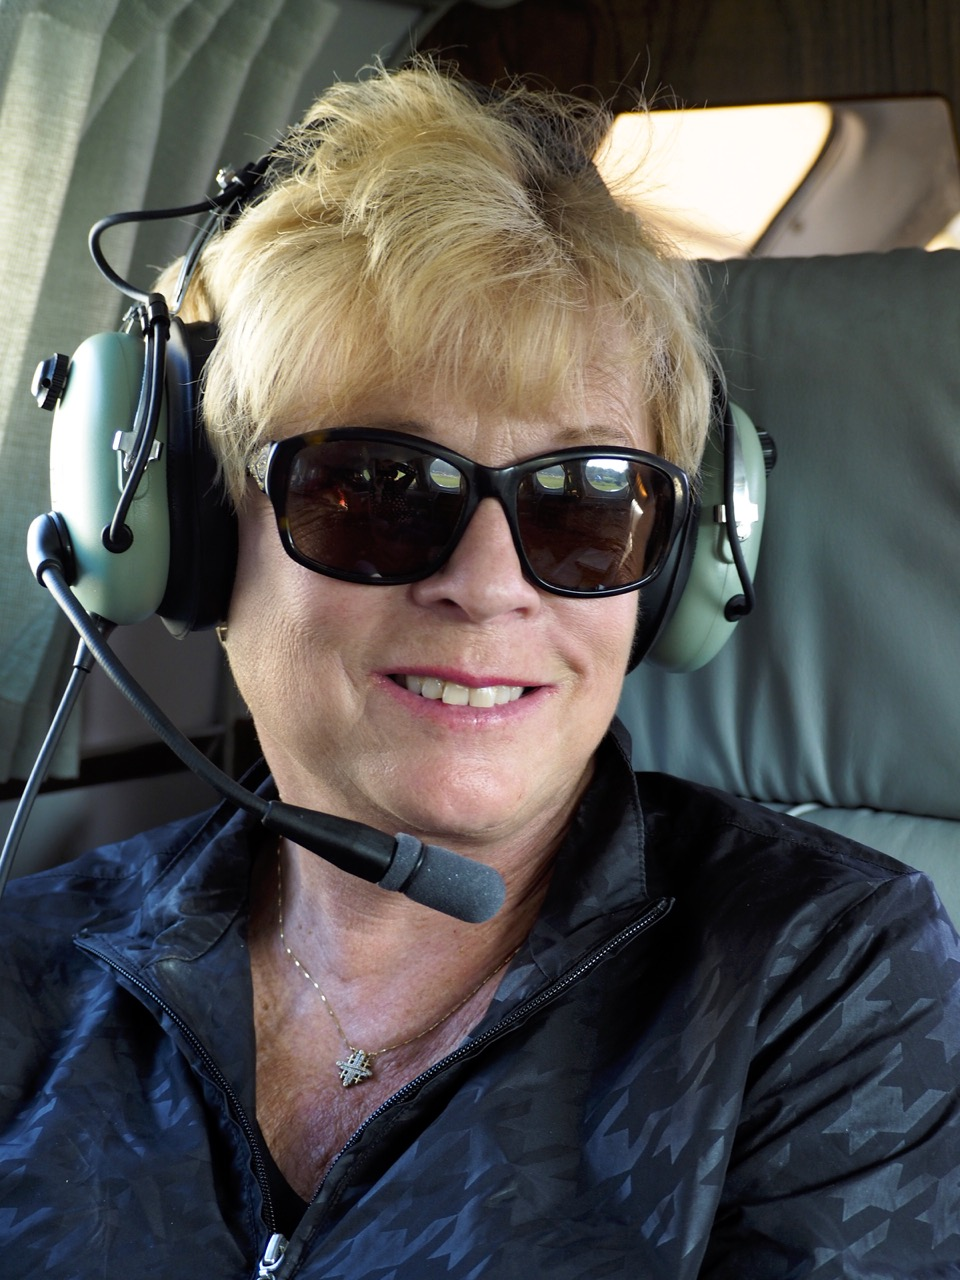 cindi_apostleIsland_lighthouse_flight_spiritedtable_photo06.jpg